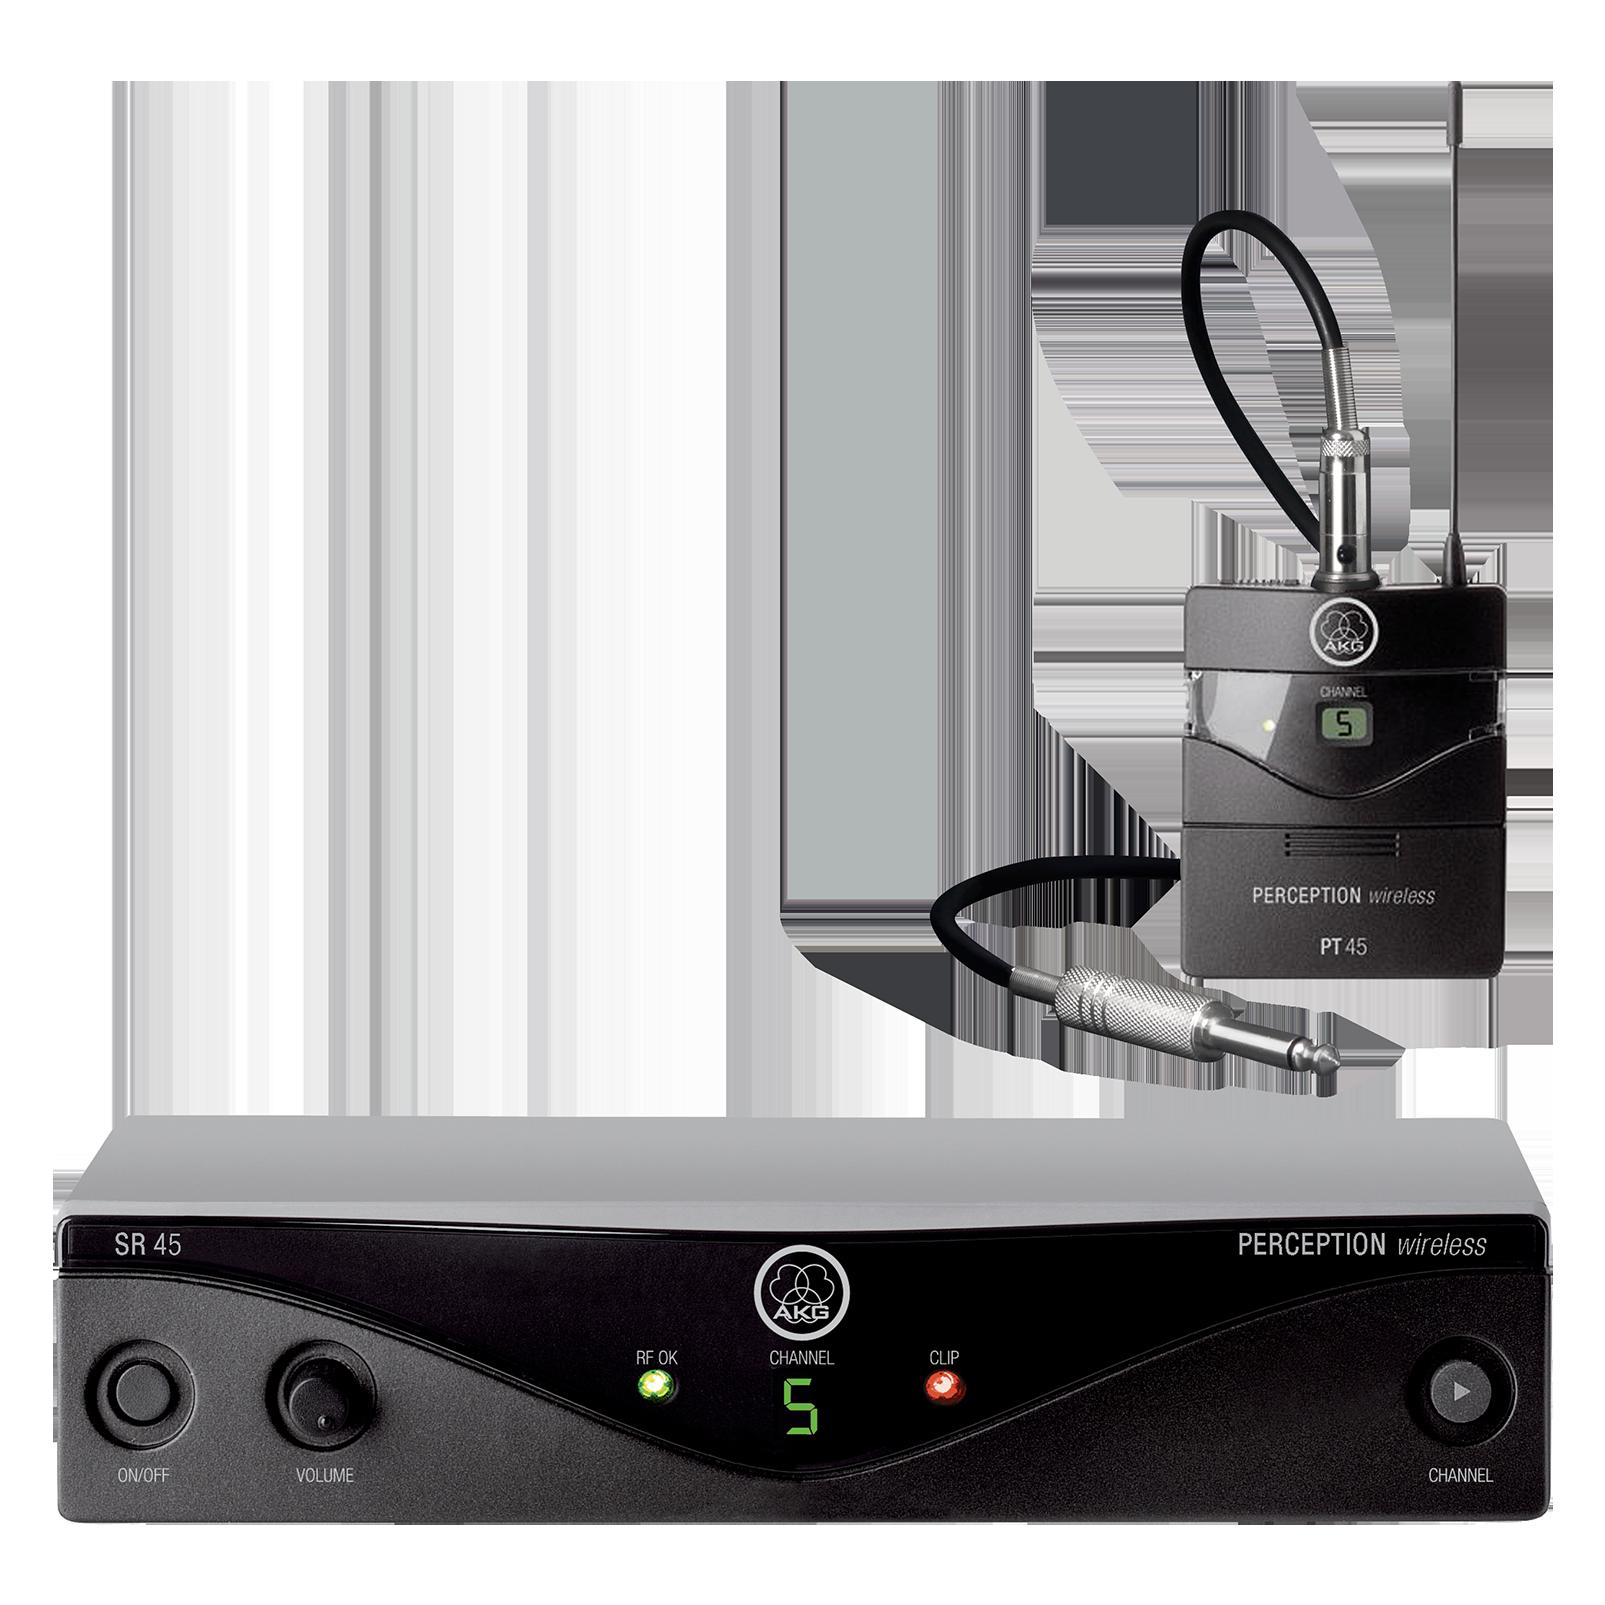 Perception Wireless 45 Instrumental Set Band-U1 - Black - High-performance wireless microphone system - Hero